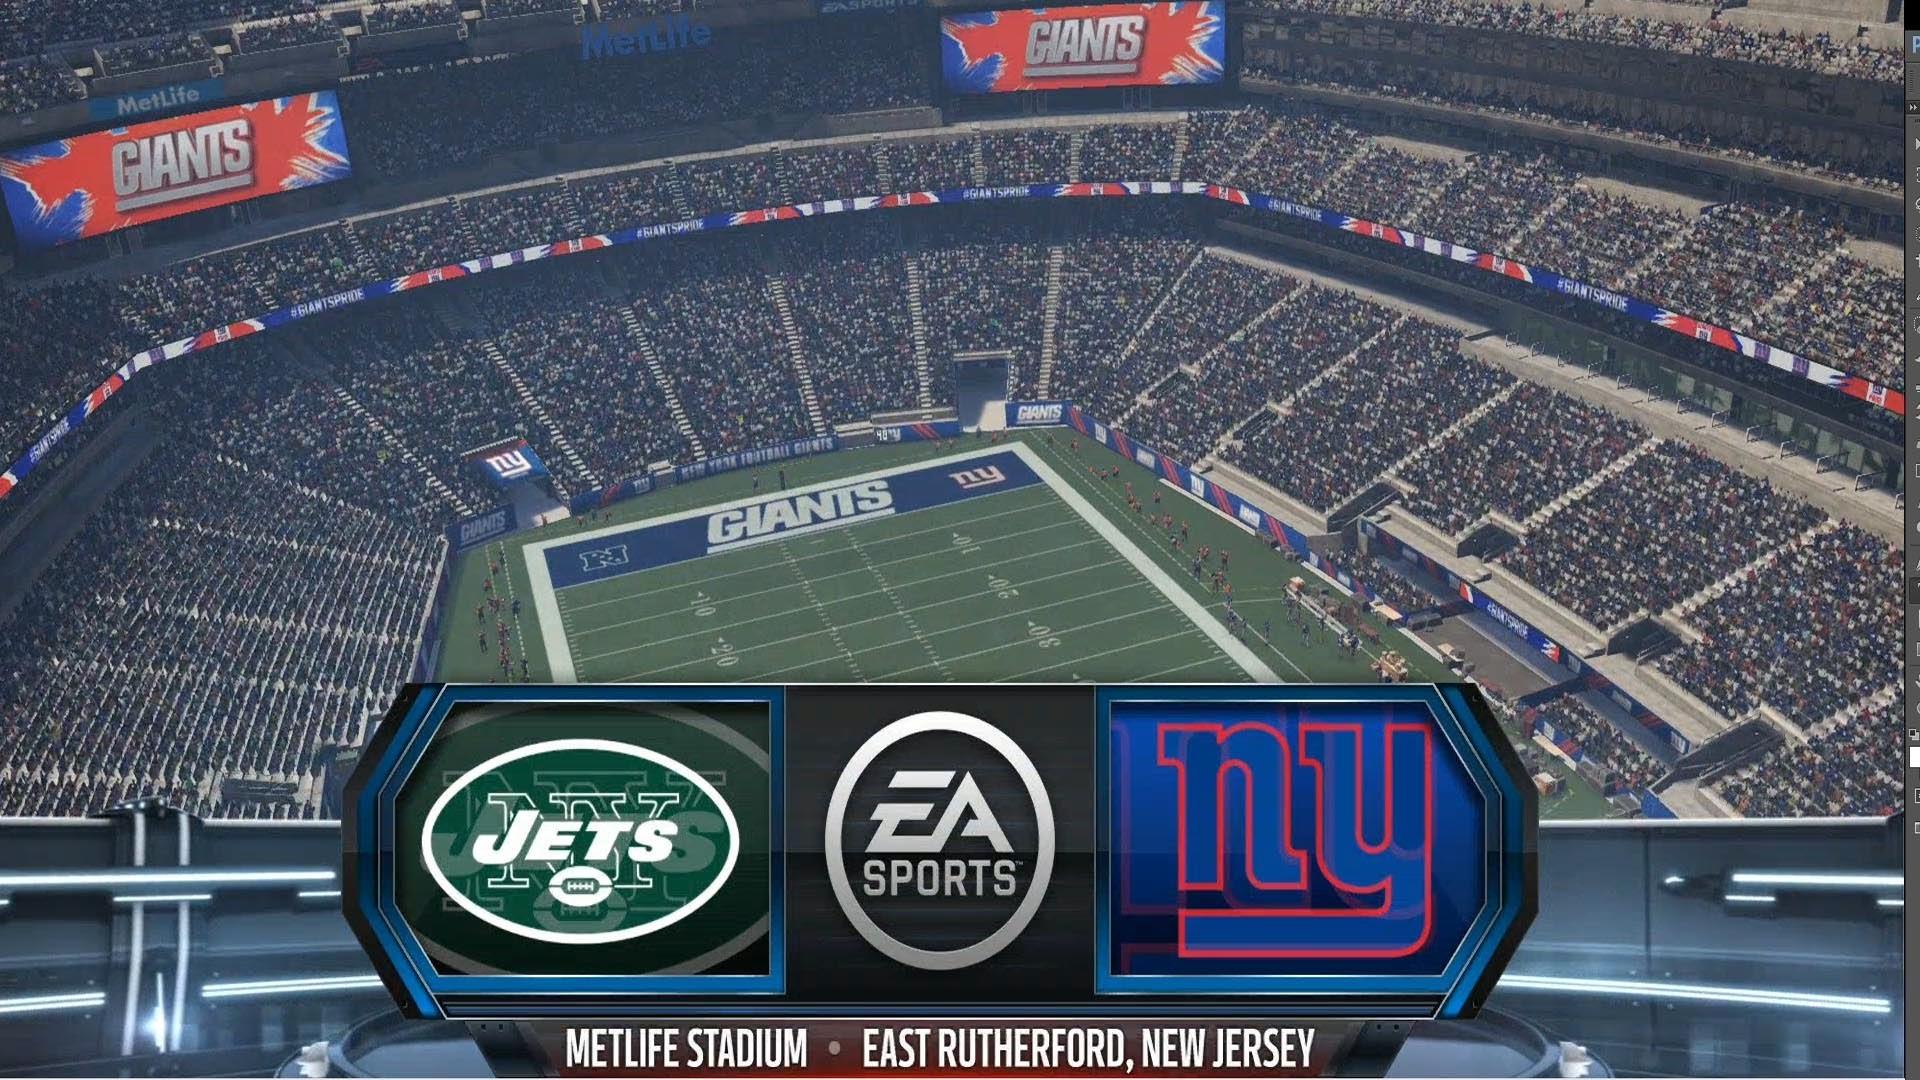 Madden NFL 16 – New York Jets vs New York Giants Gameplay [ HD ] – YouTube